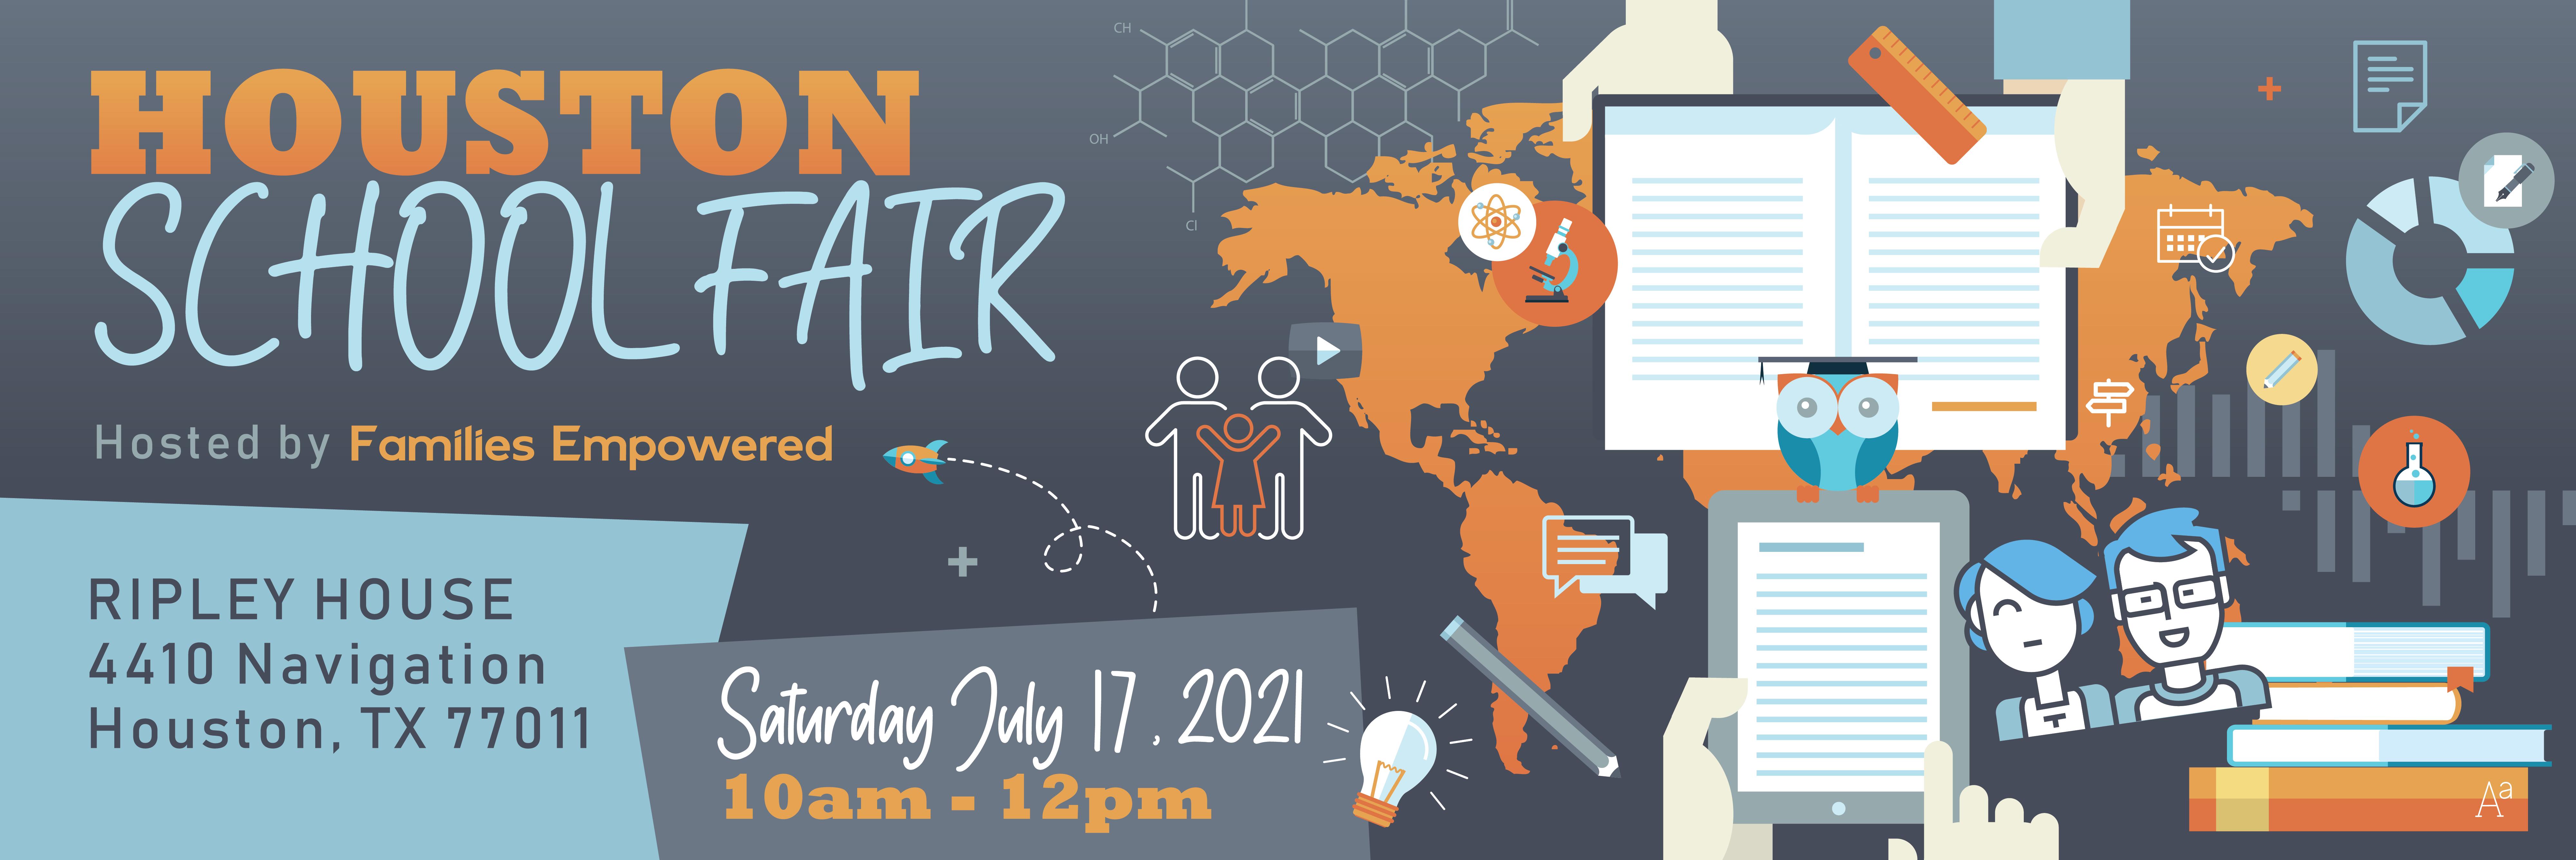 Houston school fair web banner-01